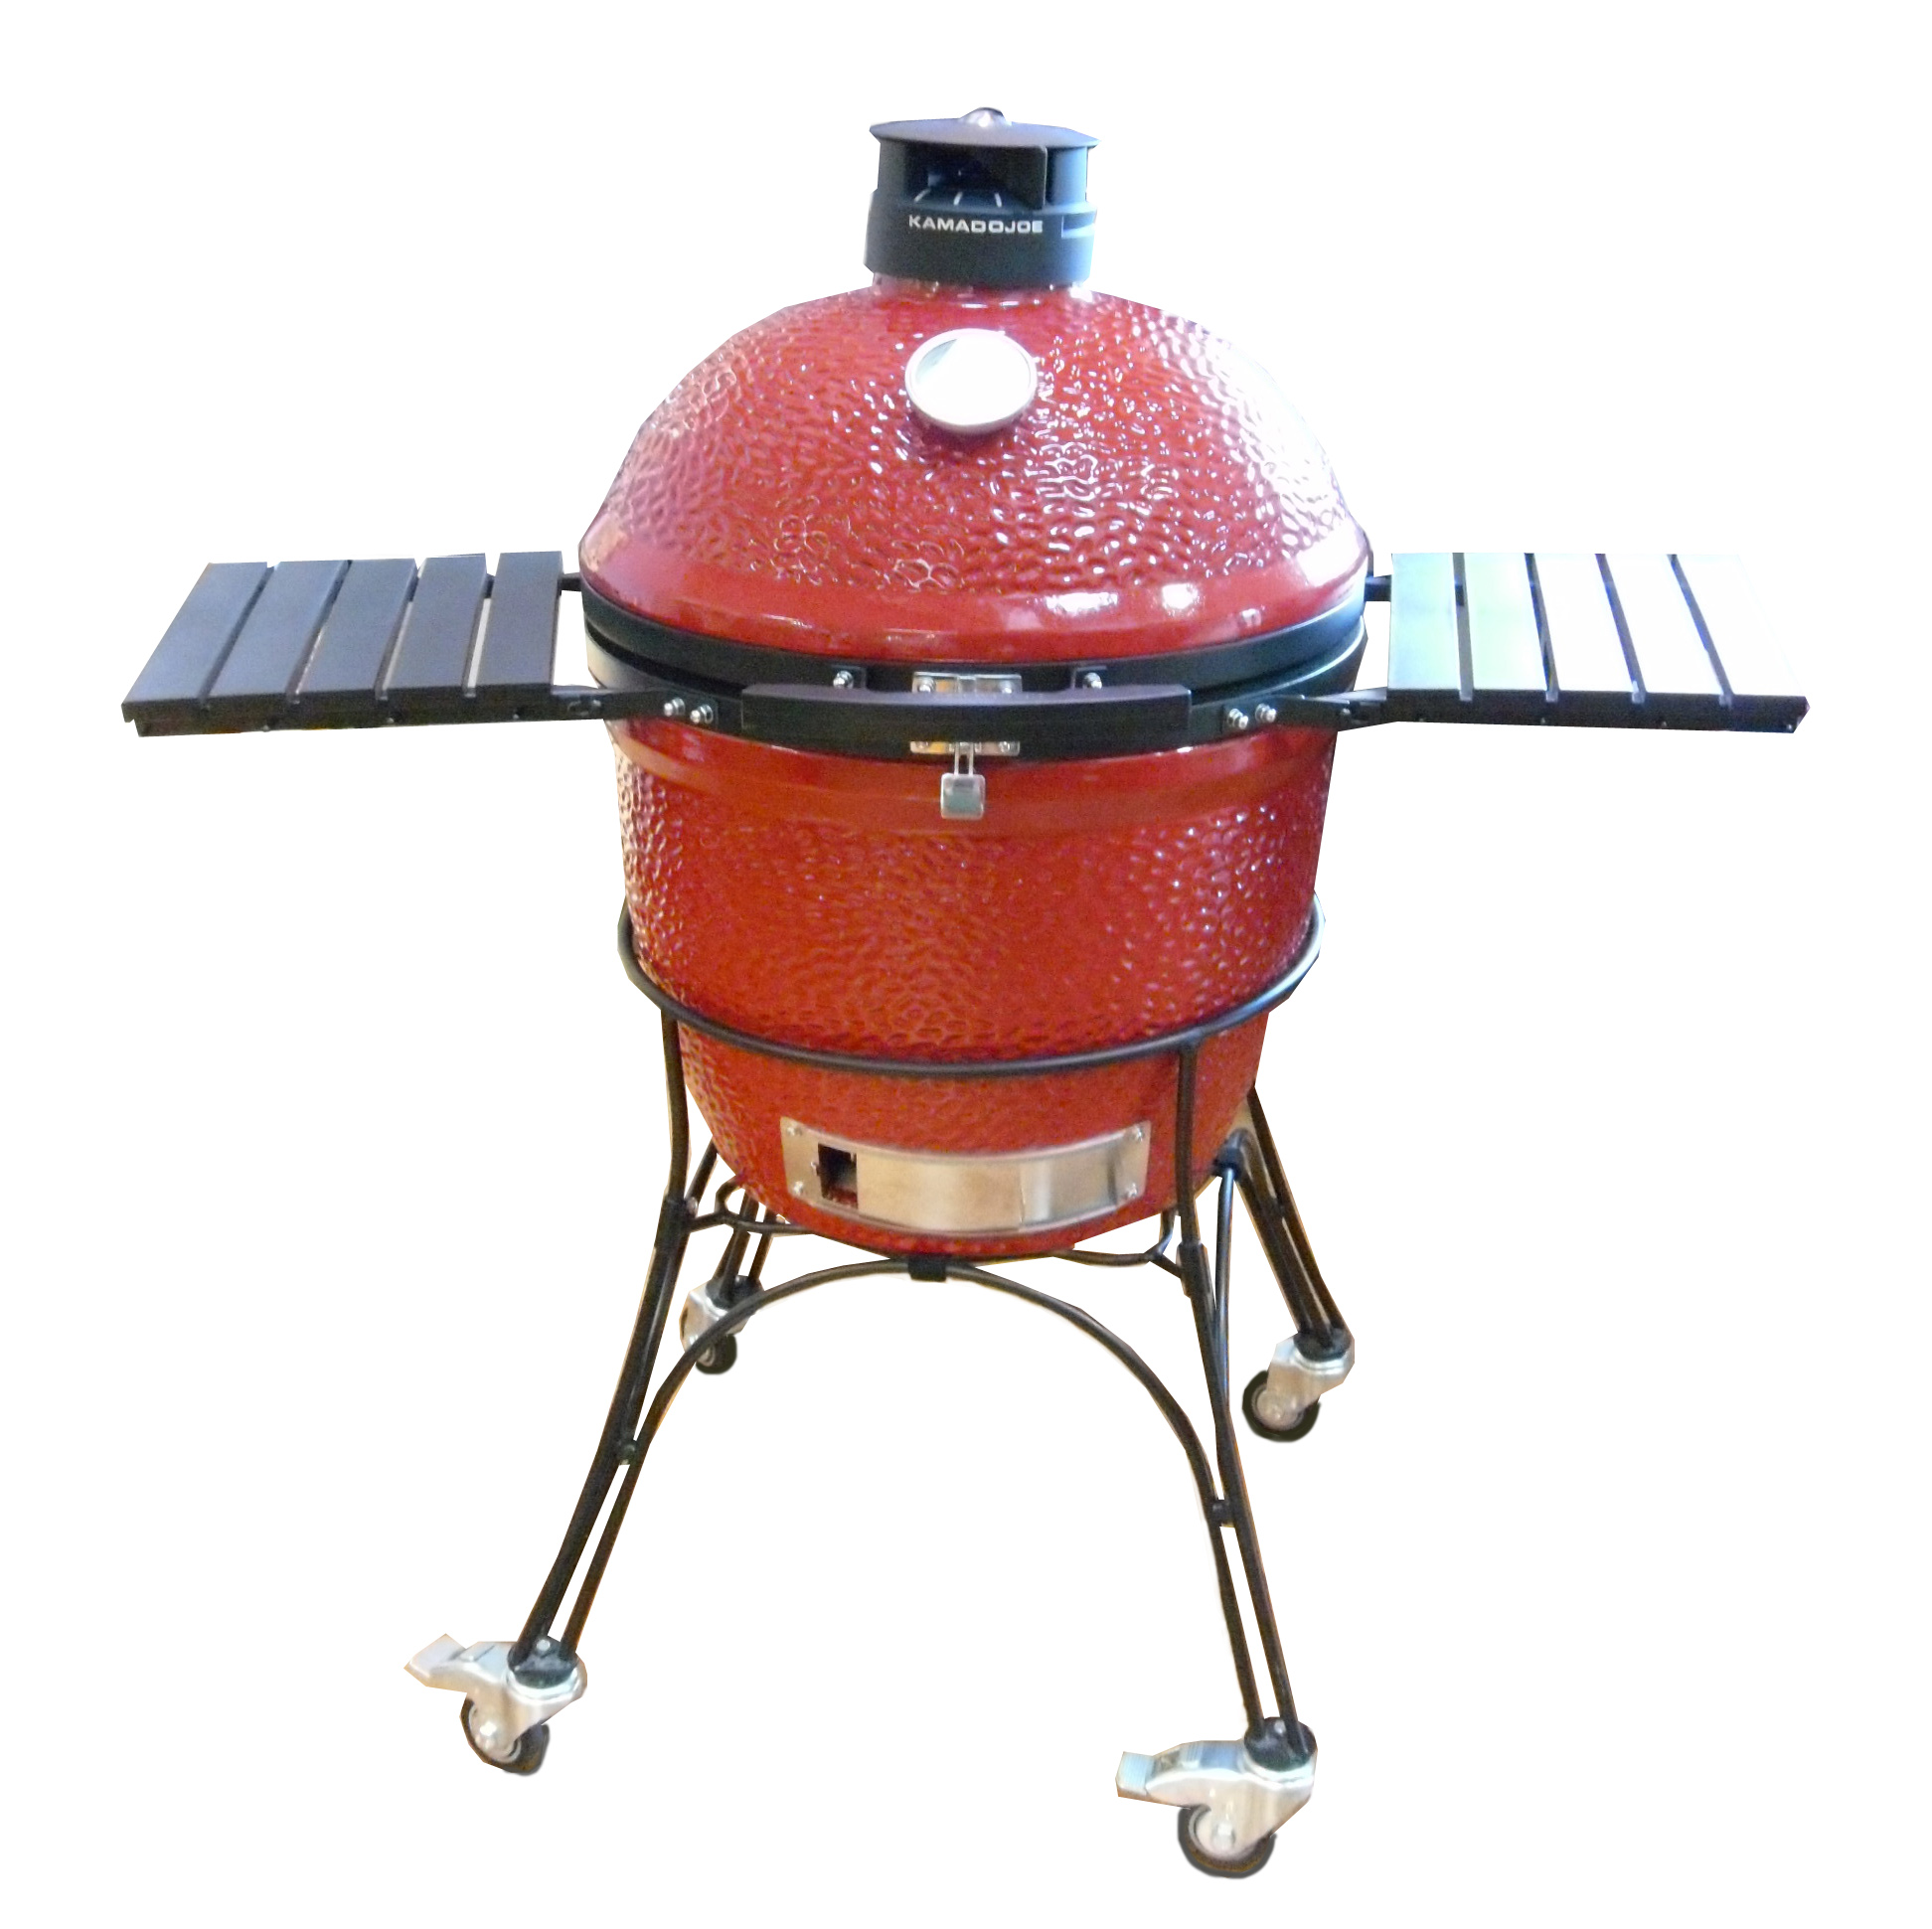 kamado joe classic joe ii 18 red keramik grill. Black Bedroom Furniture Sets. Home Design Ideas